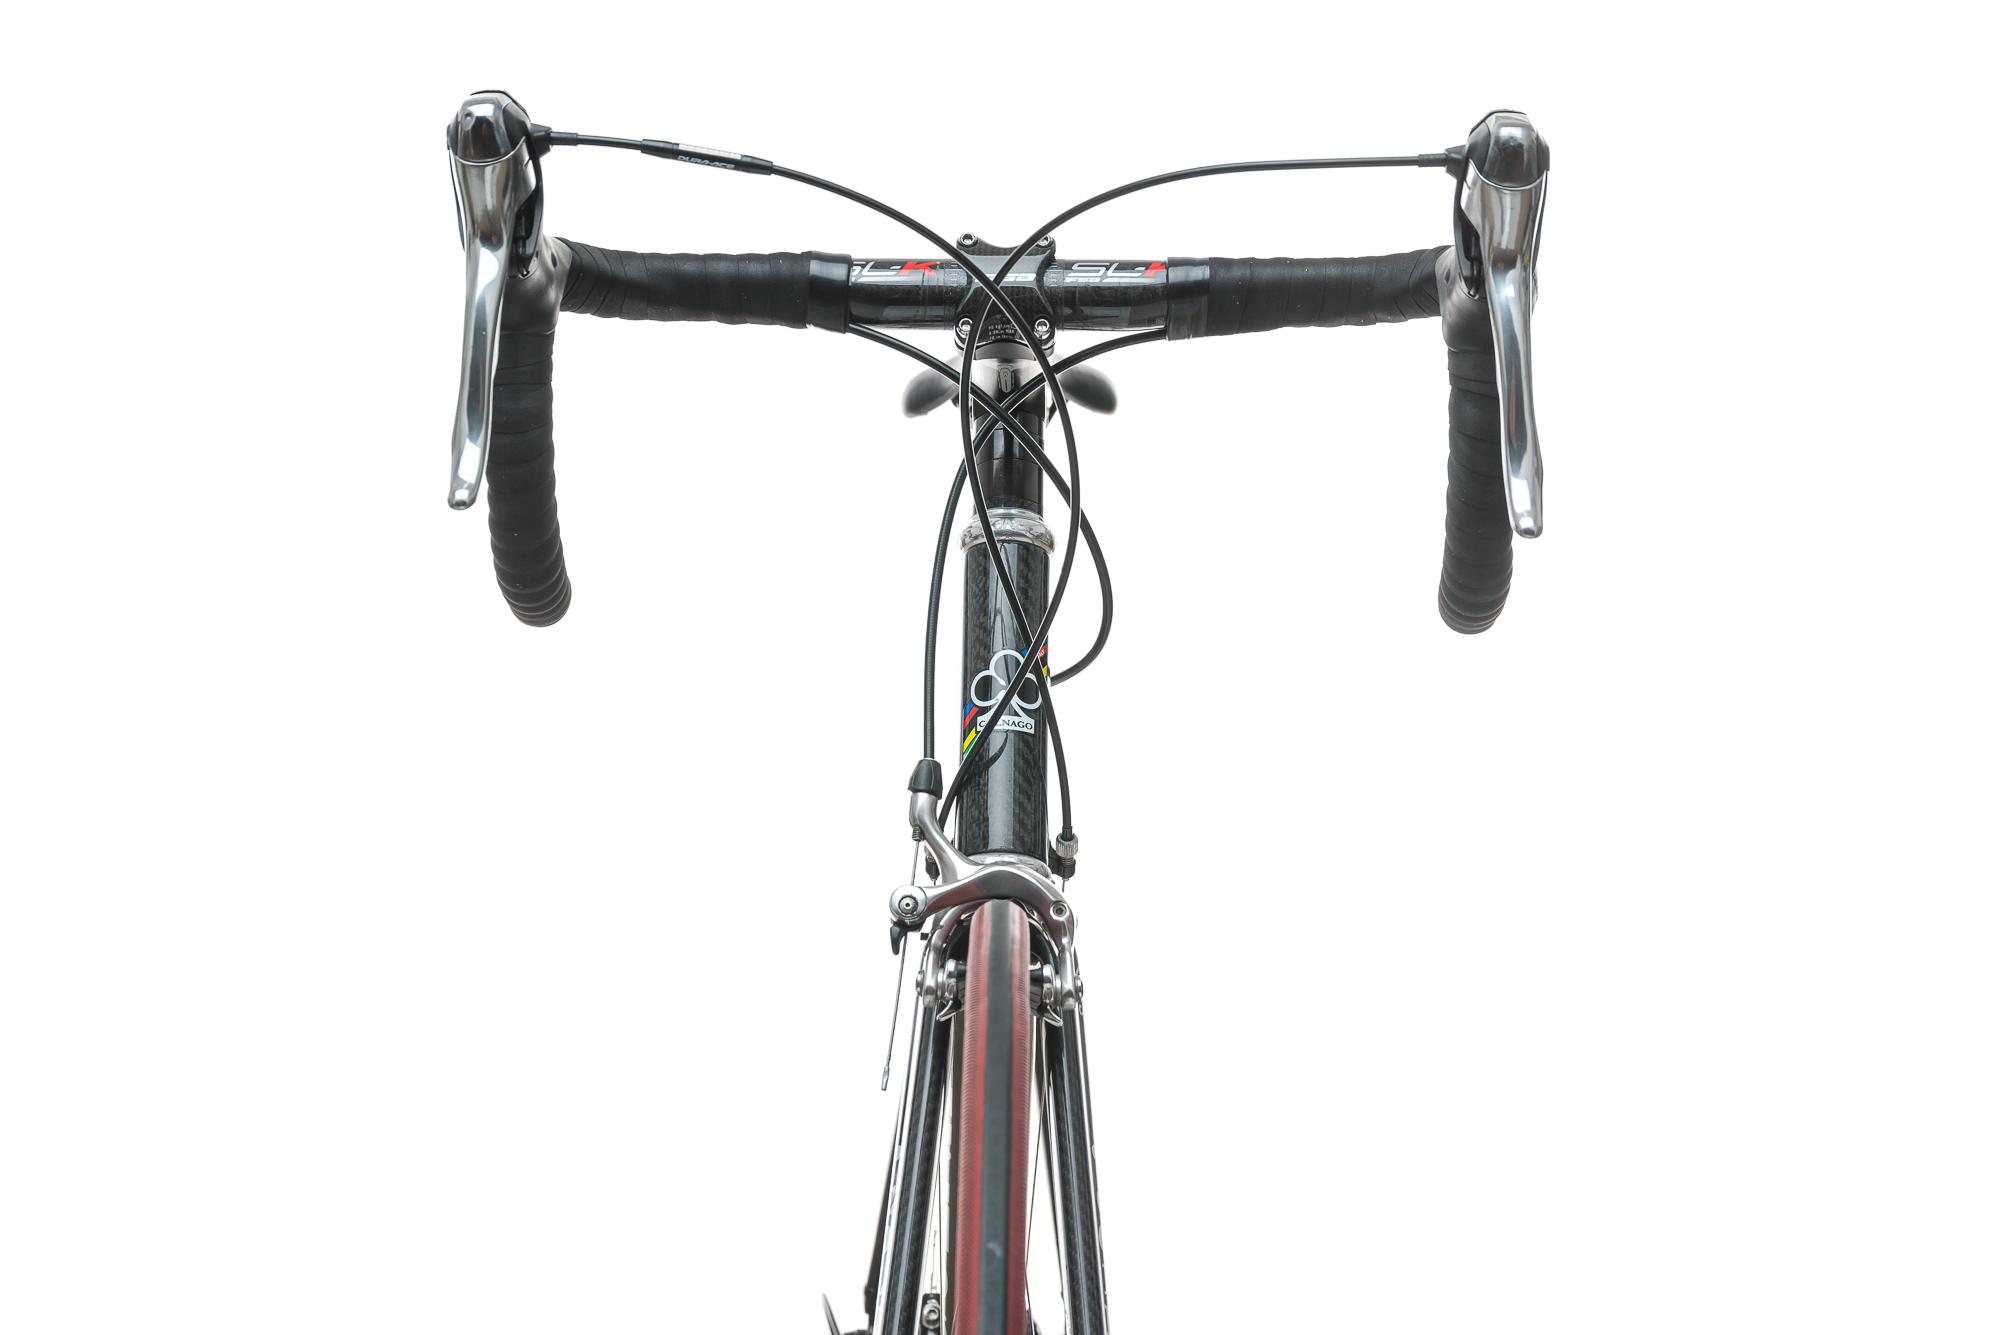 2010 Colnago C50 Road Bike 56cm Large Carbon Shimano Dura-Ace 7800 ...